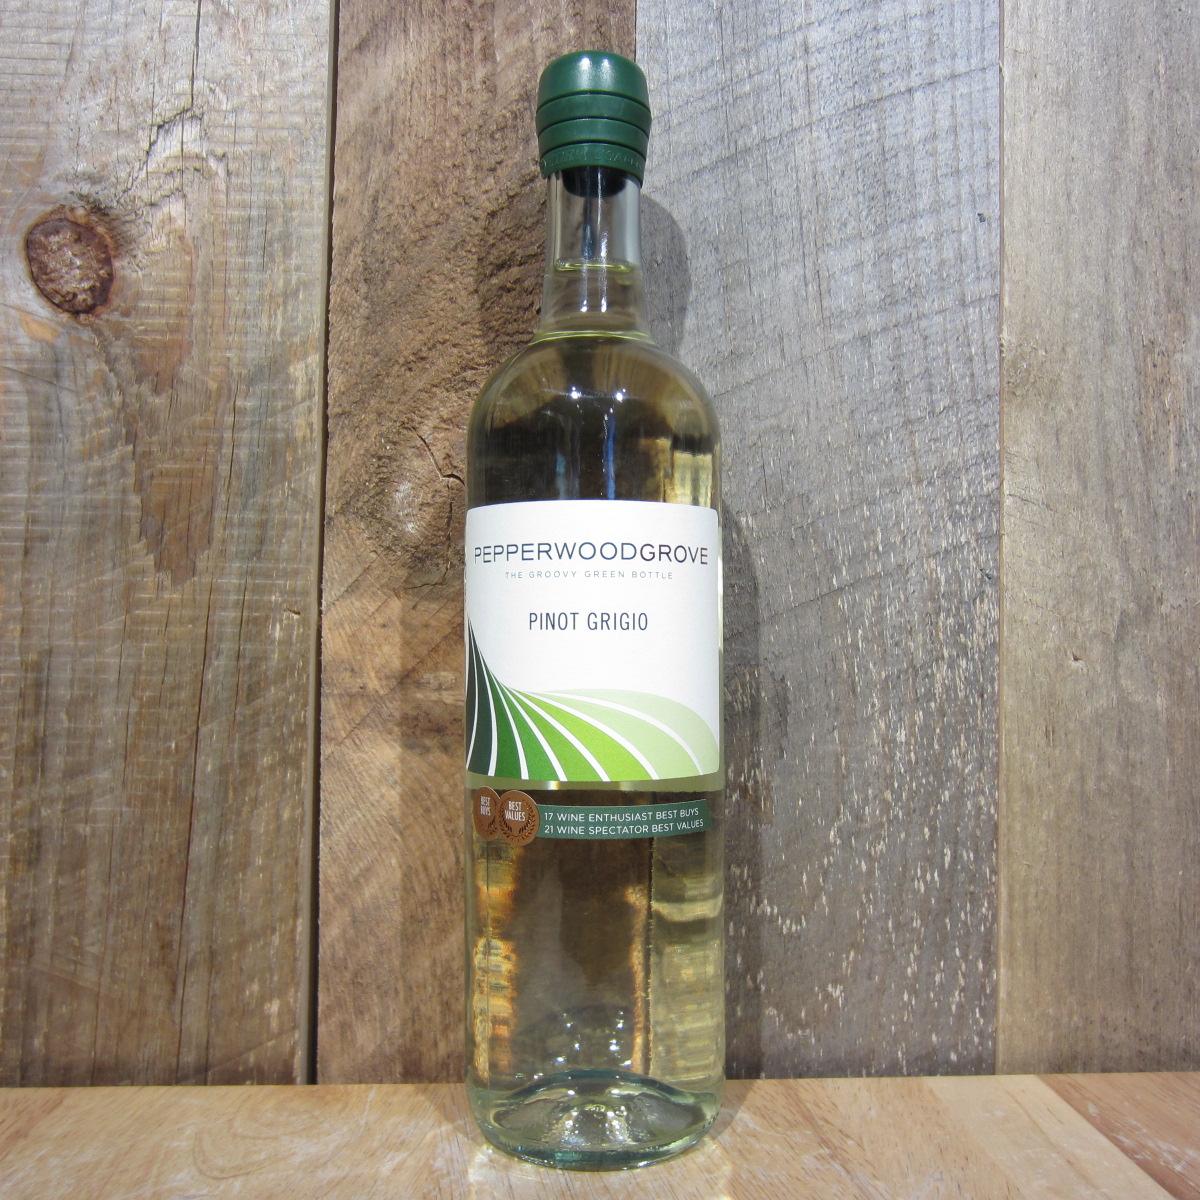 Pepperwood Grove Pinot Grigio 750ml Oak And Barrel